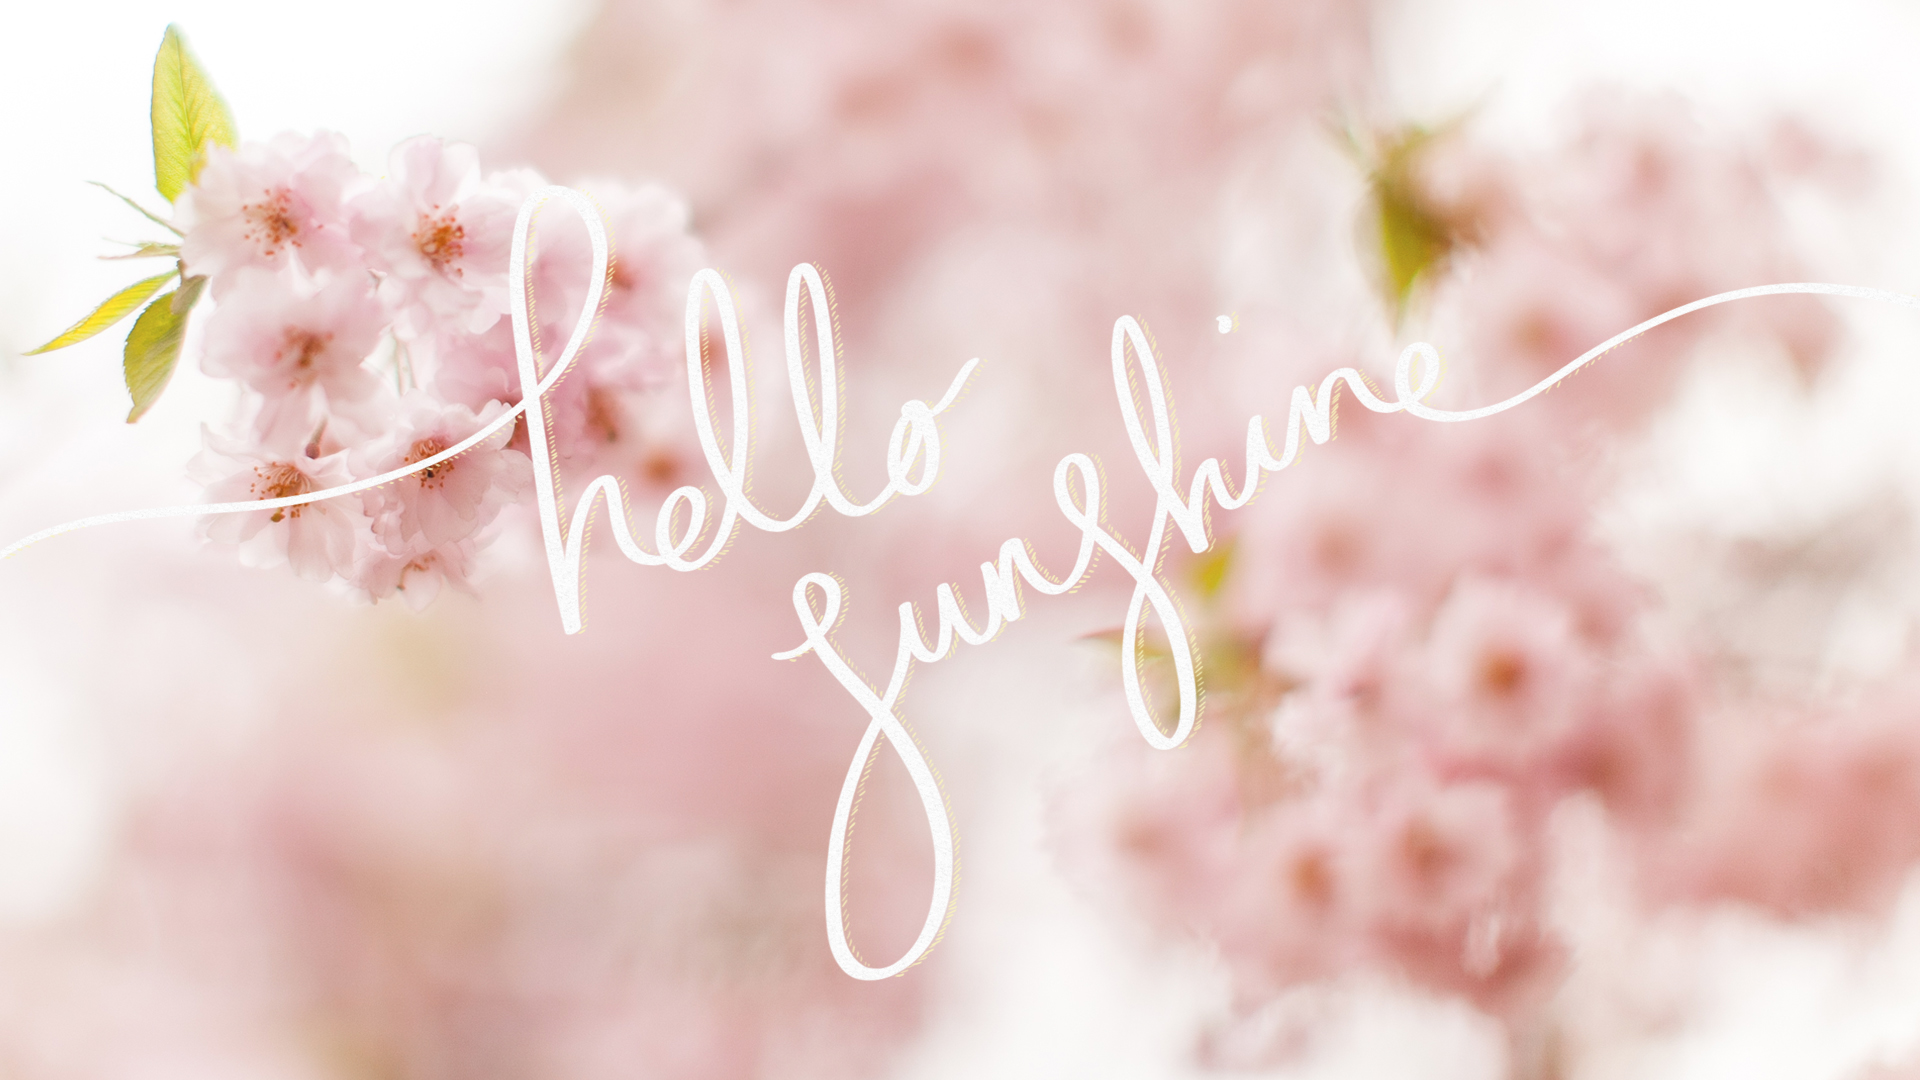 Hustle Quotes Wallpaper Hello Sunshine A Free Cherry Blossom Desktop Wallpaper